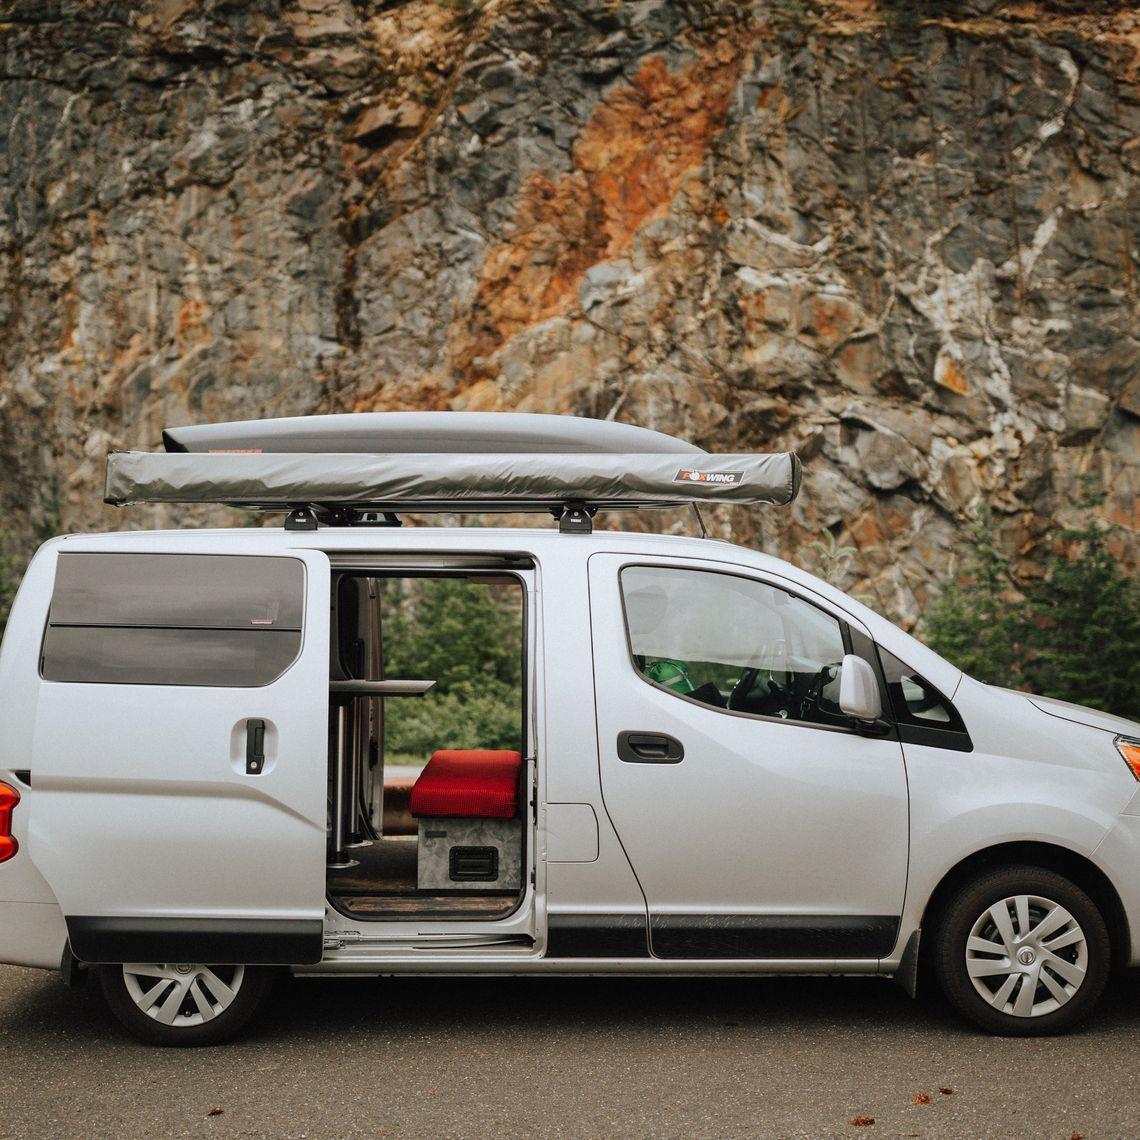 The 5 Best Affordable Rvs And Camper Vans For Sale